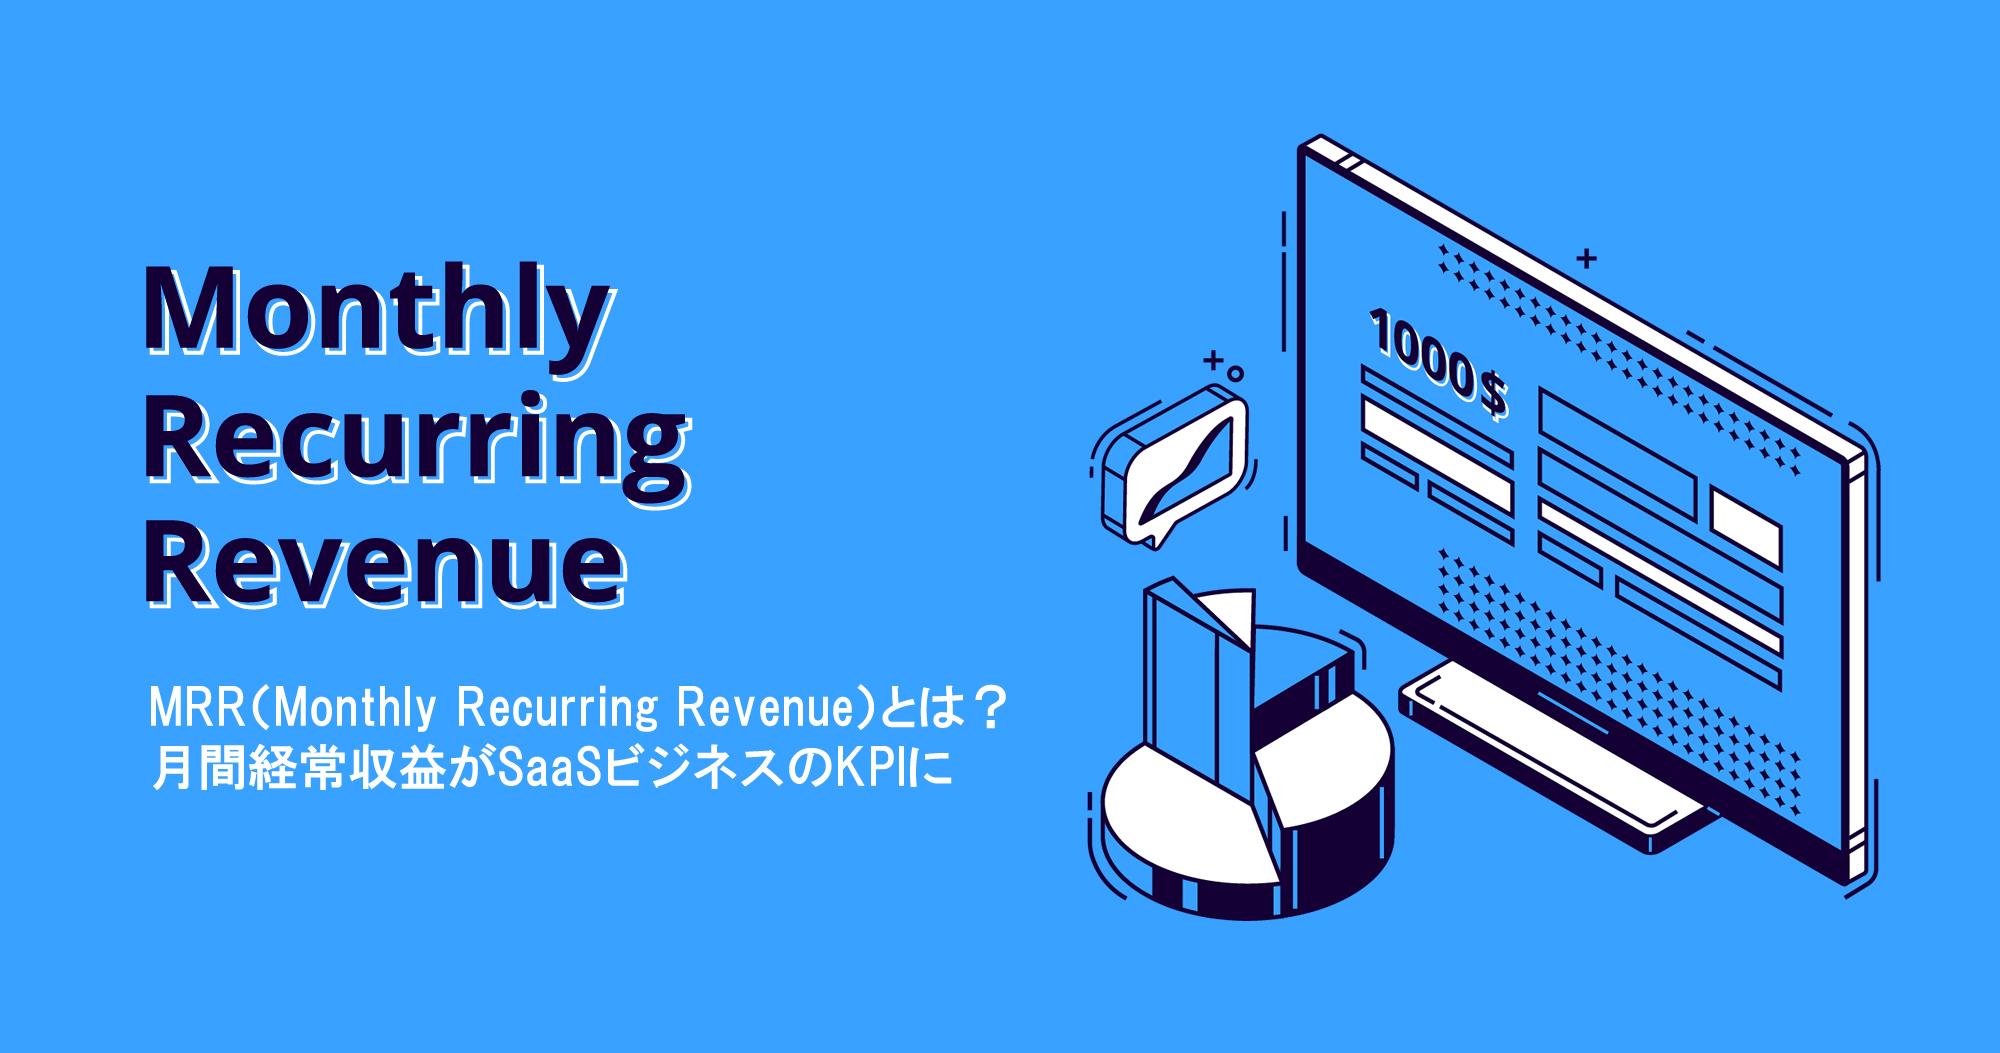 MRR(Monthly Recurring Revenue)とは?月間経常収益がSaaSビジネスのKPIに